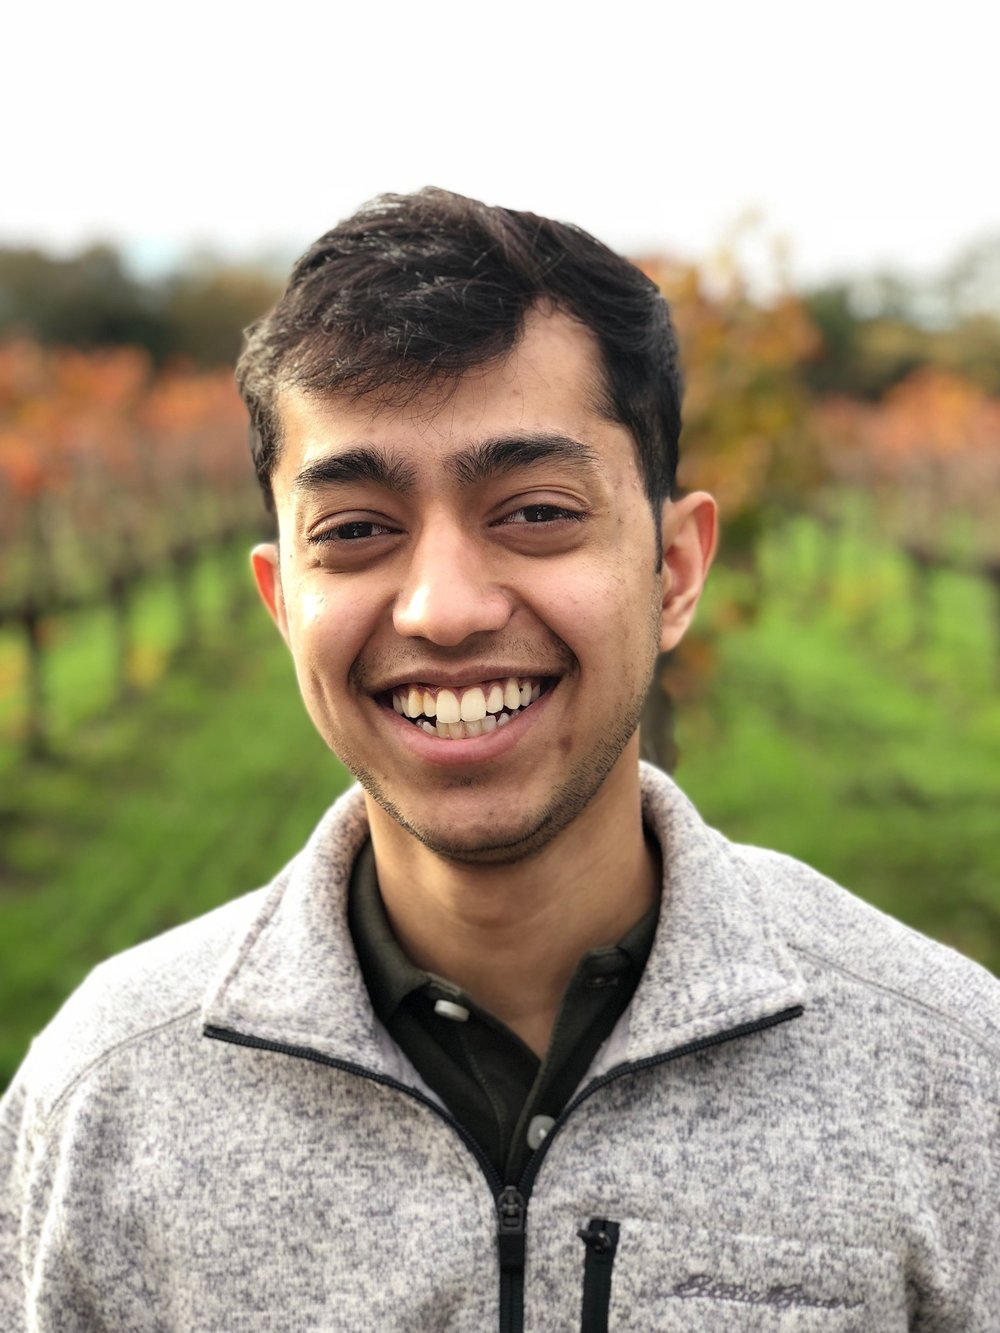 Mahdir Ishmam ,Data Engineer at ThousandEyes. He is a history buff,dog lover and cricket fan.  mahdir@saasanalyticsmentorship.com